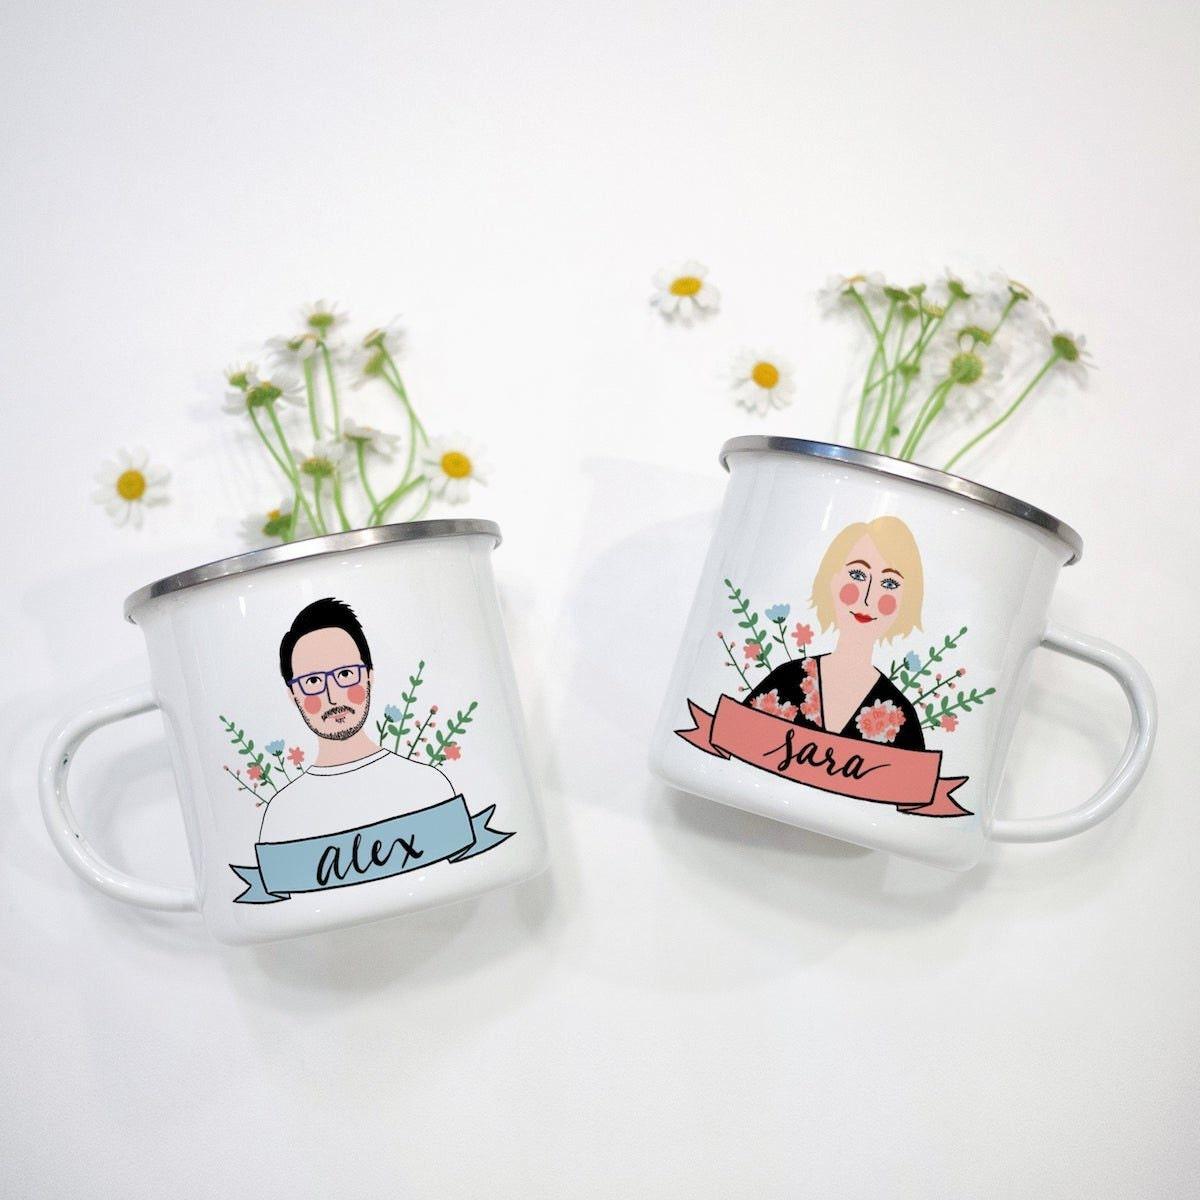 Enamel portrait mugs from Avonnie Studio